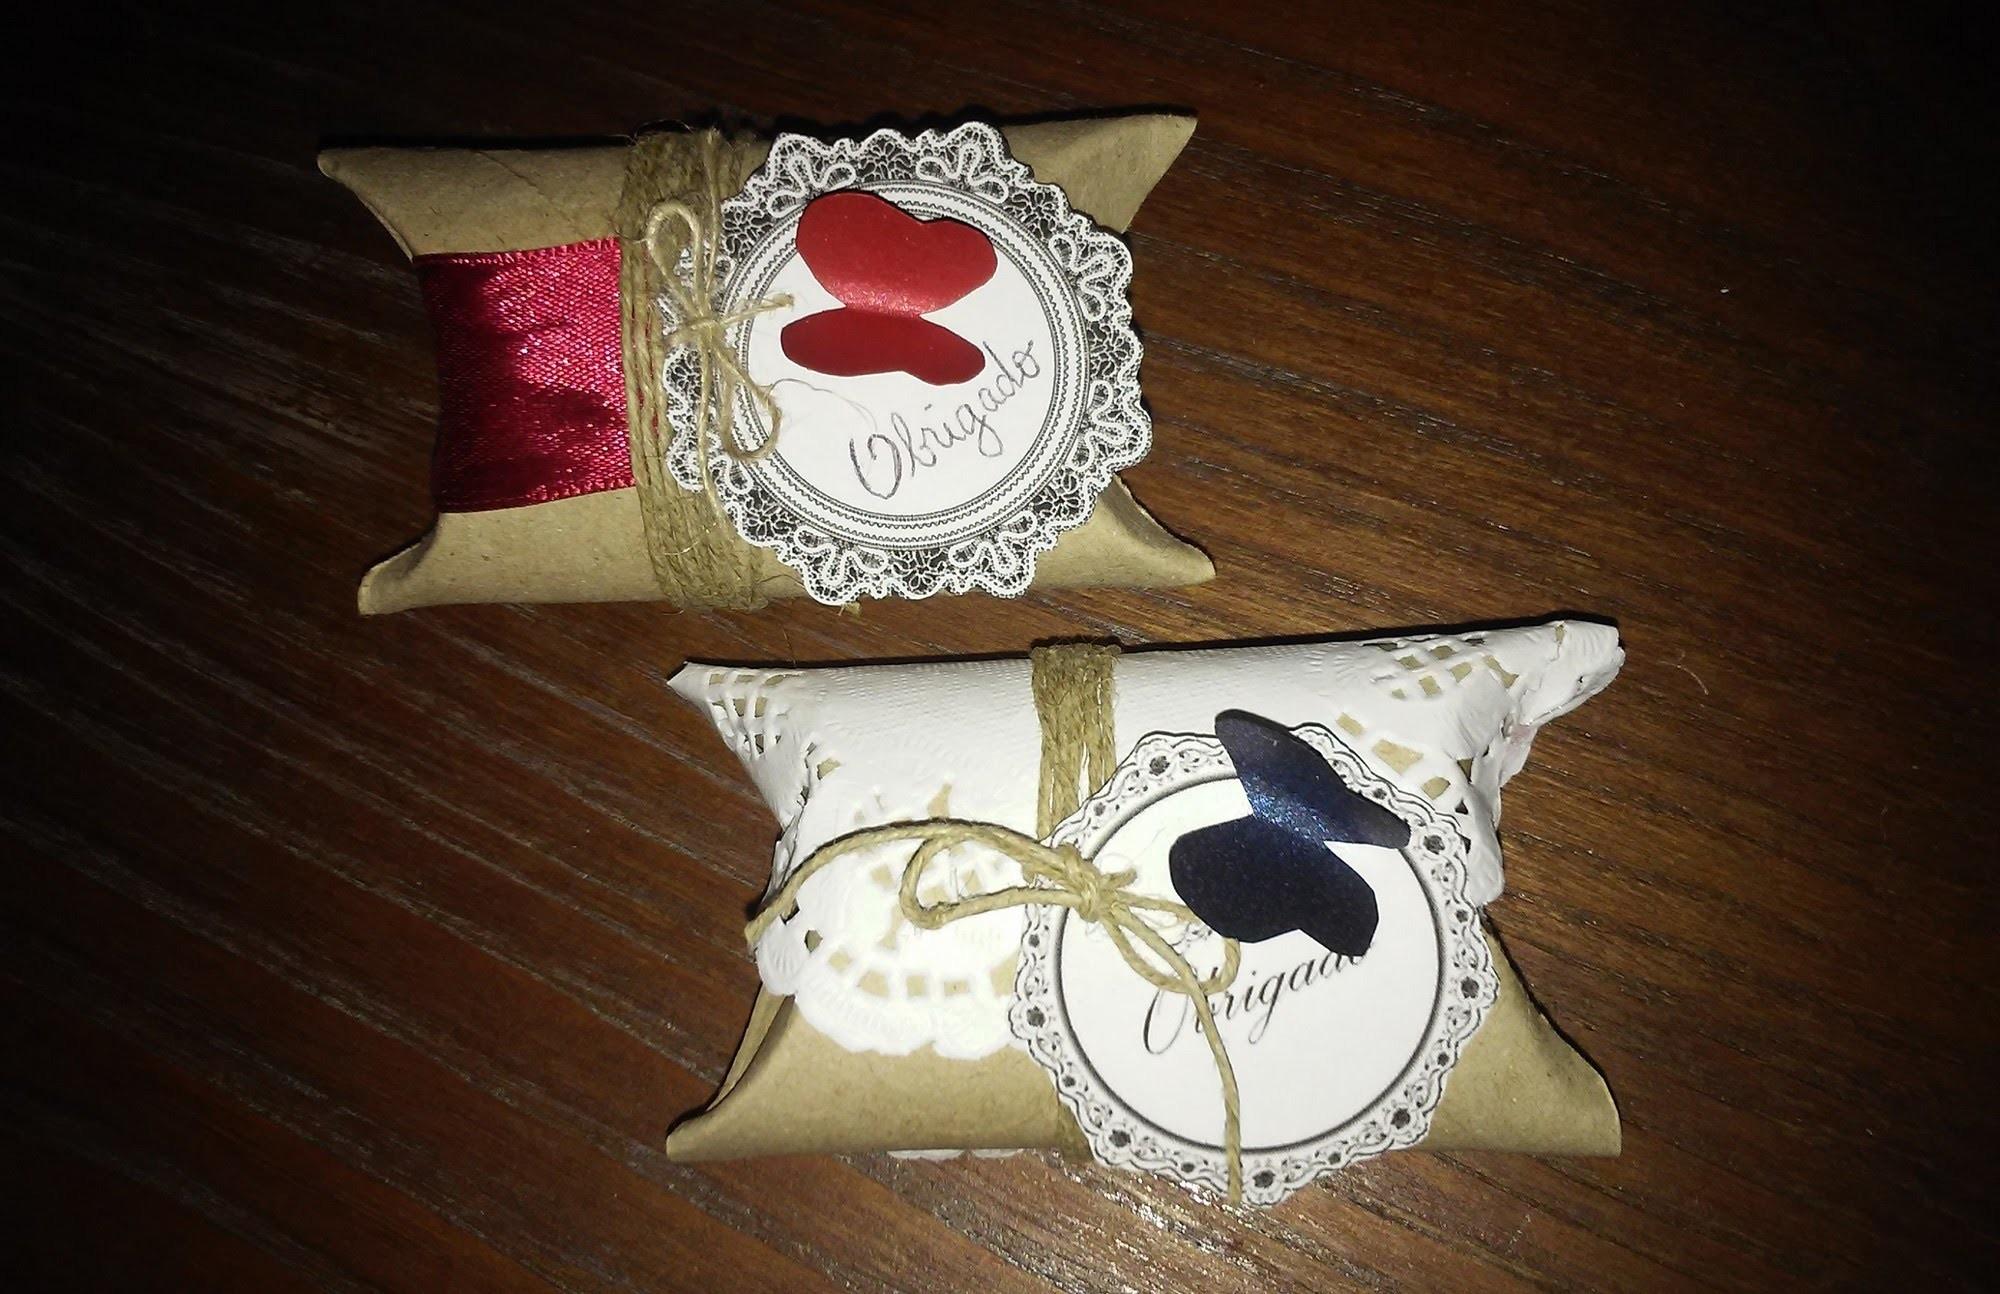 Caixa de lembrancinhas de rolo de papel - DIY - Souvenirs boxes